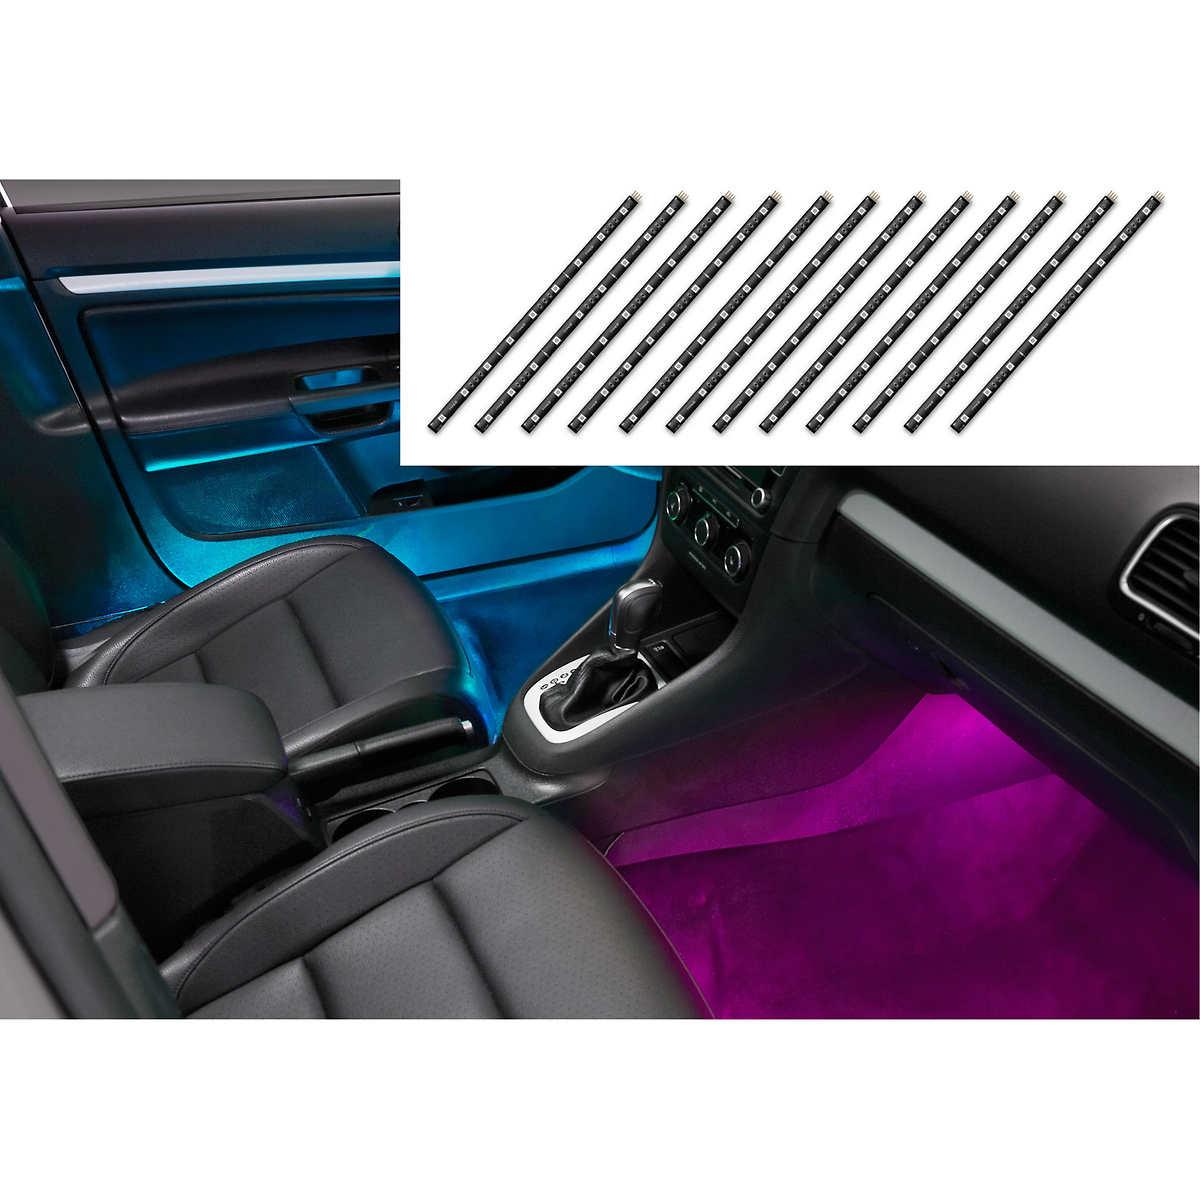 Weathertech mats costco - Smart Deluxe Plug Glow 12 Volt Multi Color Led Extension Strips 12 X